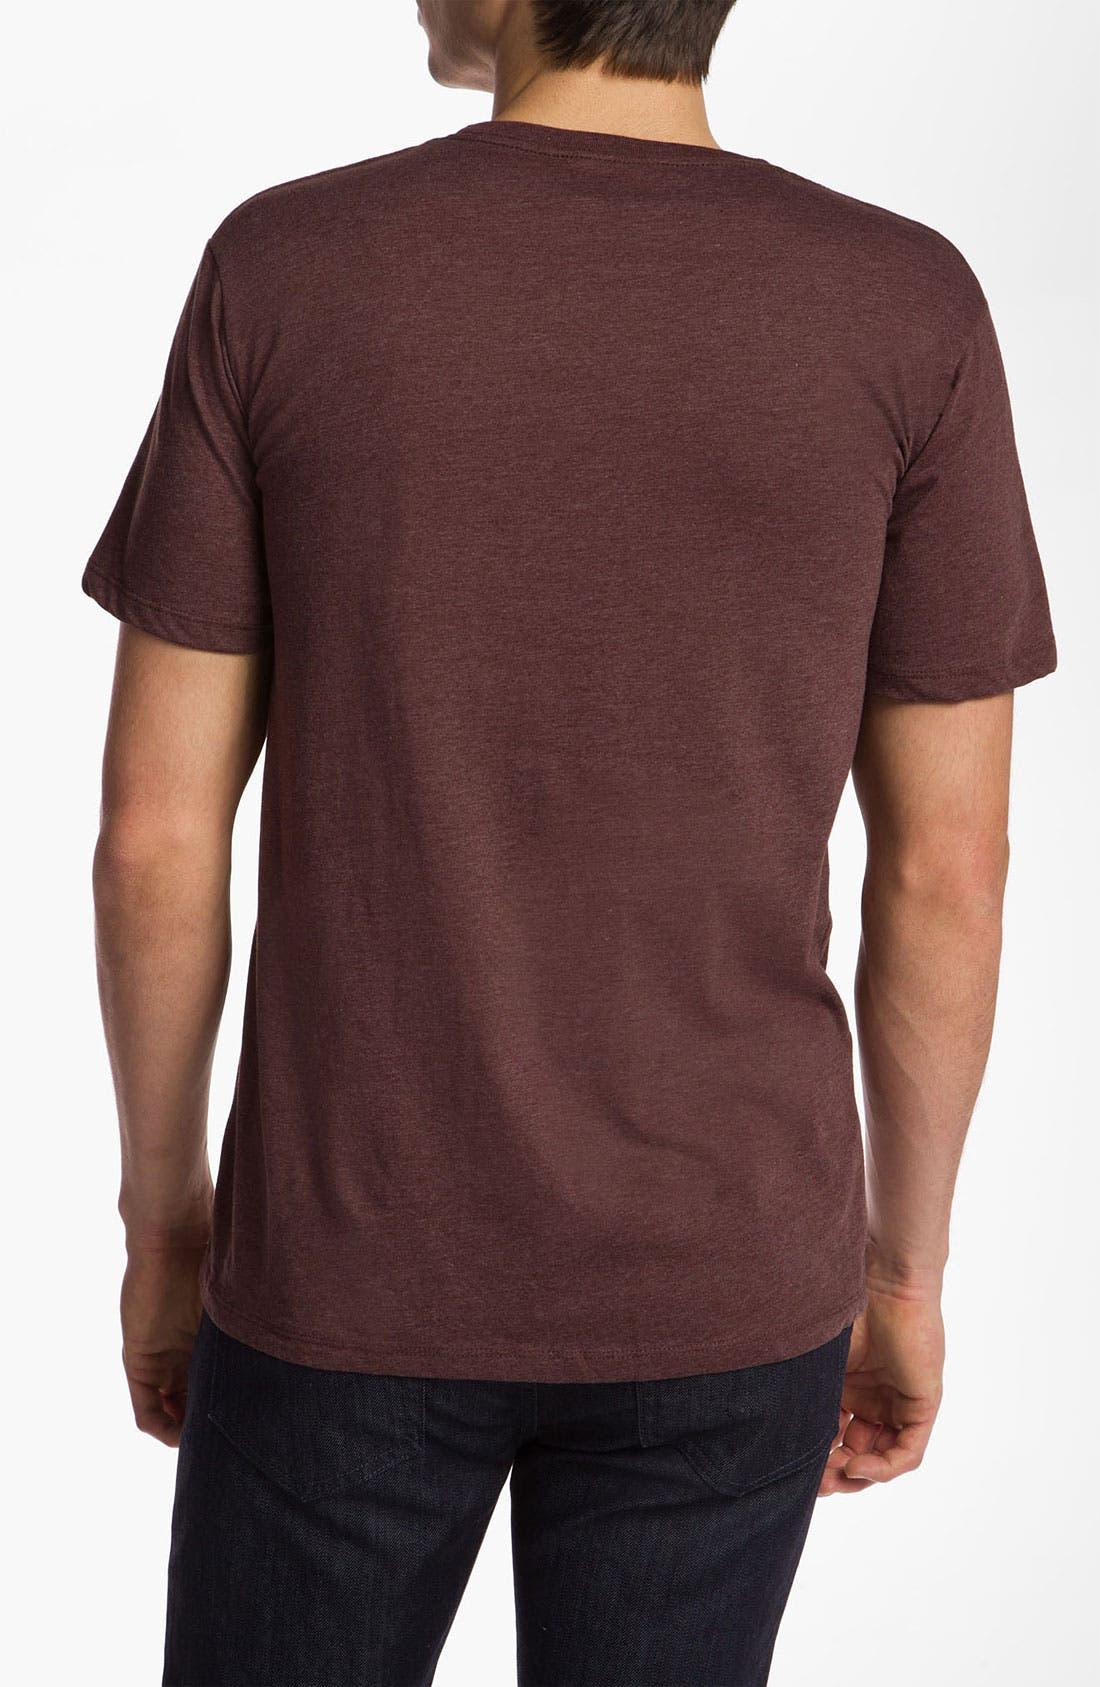 Alternate Image 2  - Headline Shirts 'Decaf' Graphic T-Shirt